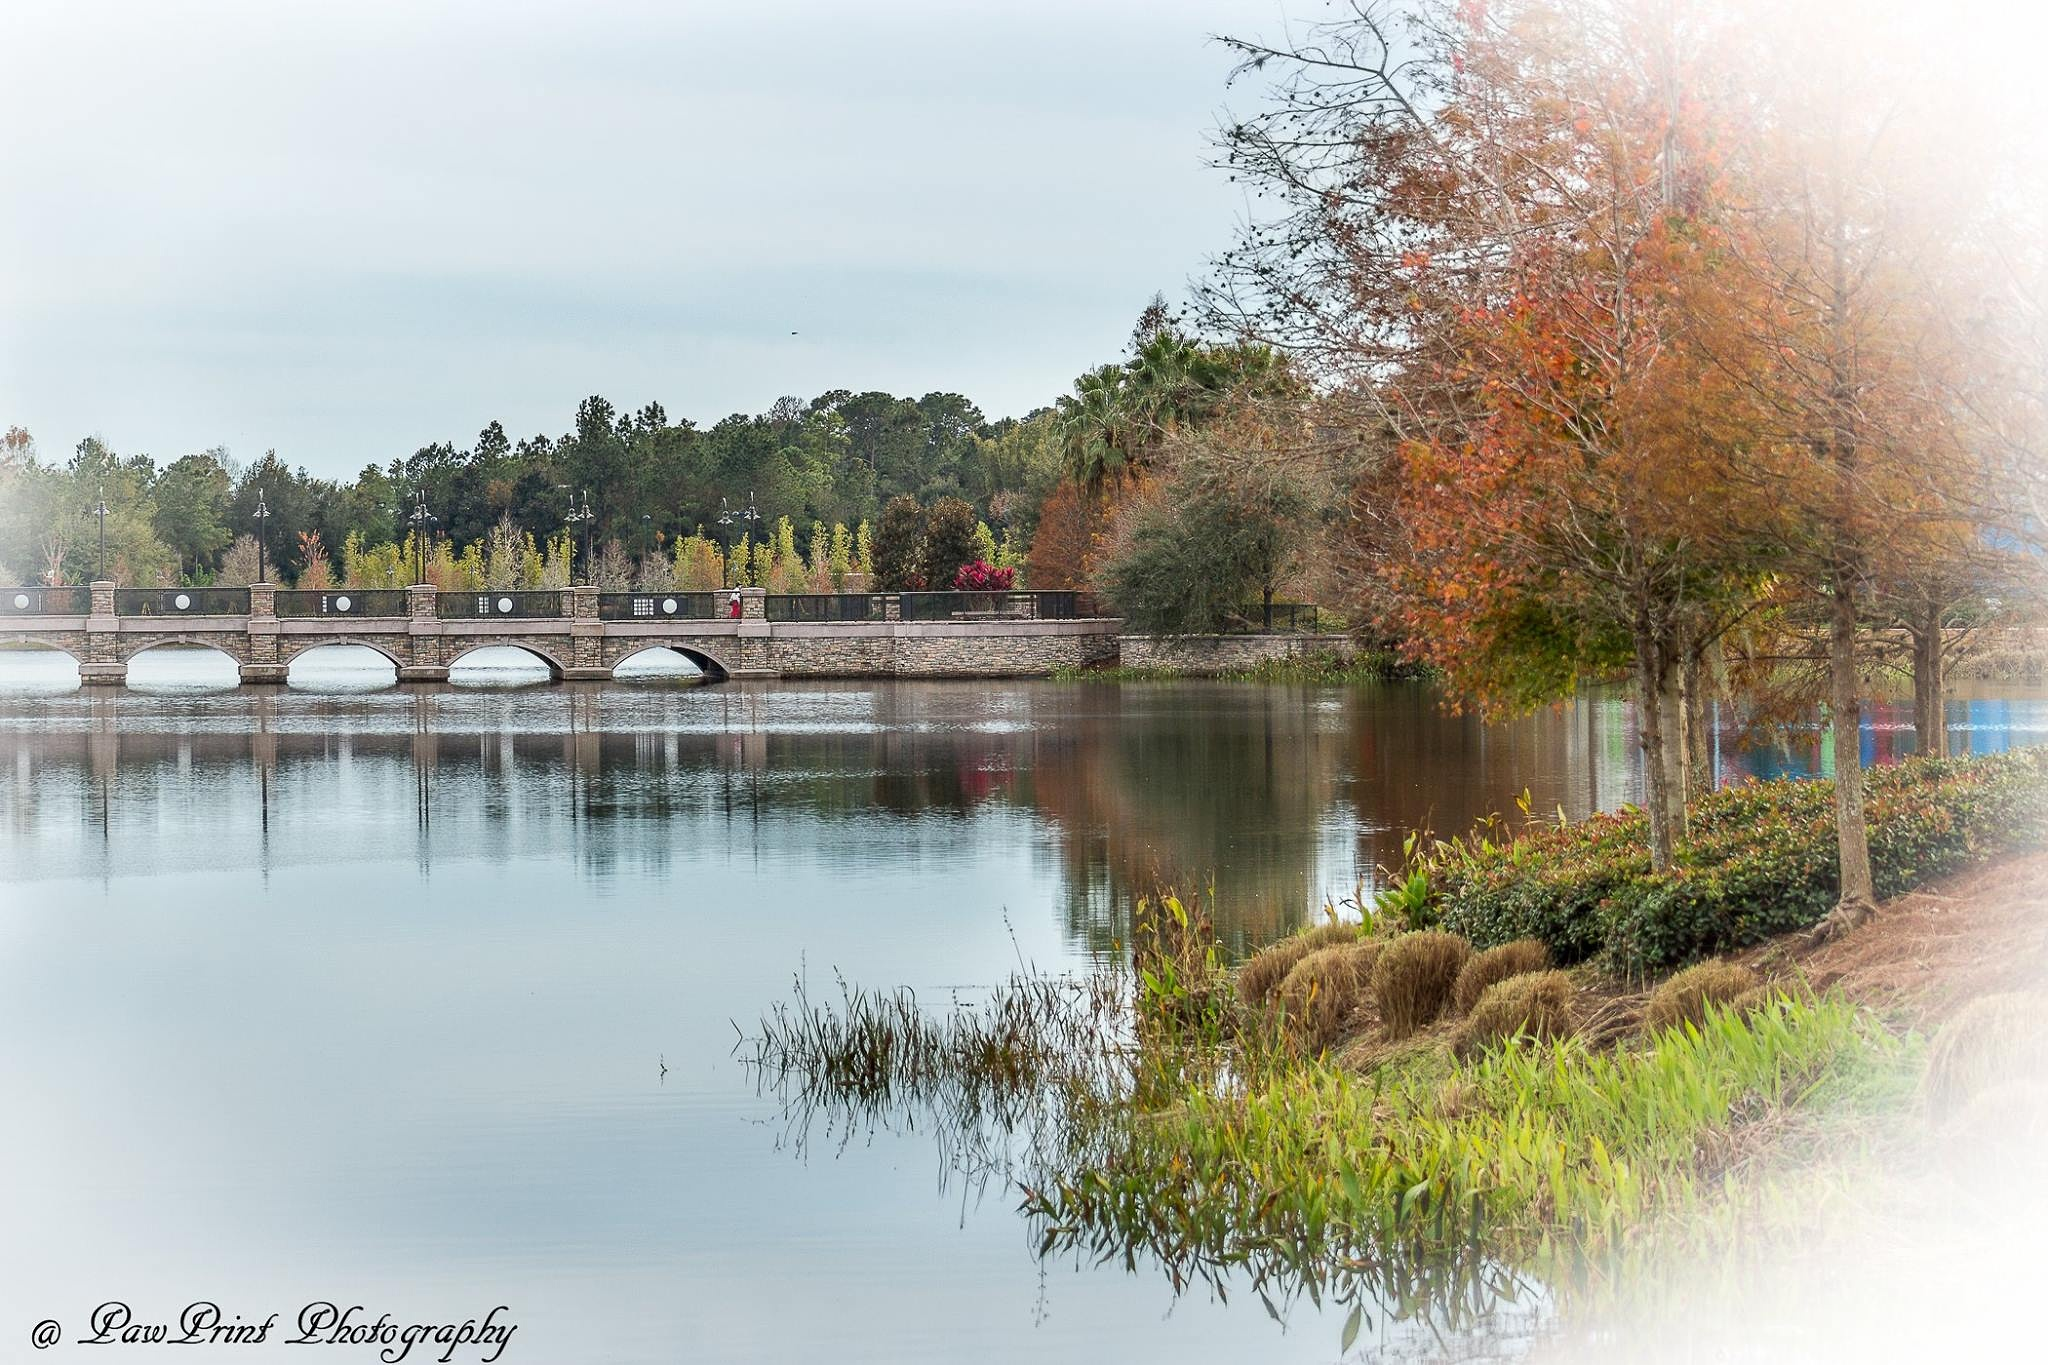 over the bridge by Lynn  Flood/PawPrint Photography/Flash Flood Photo and Design